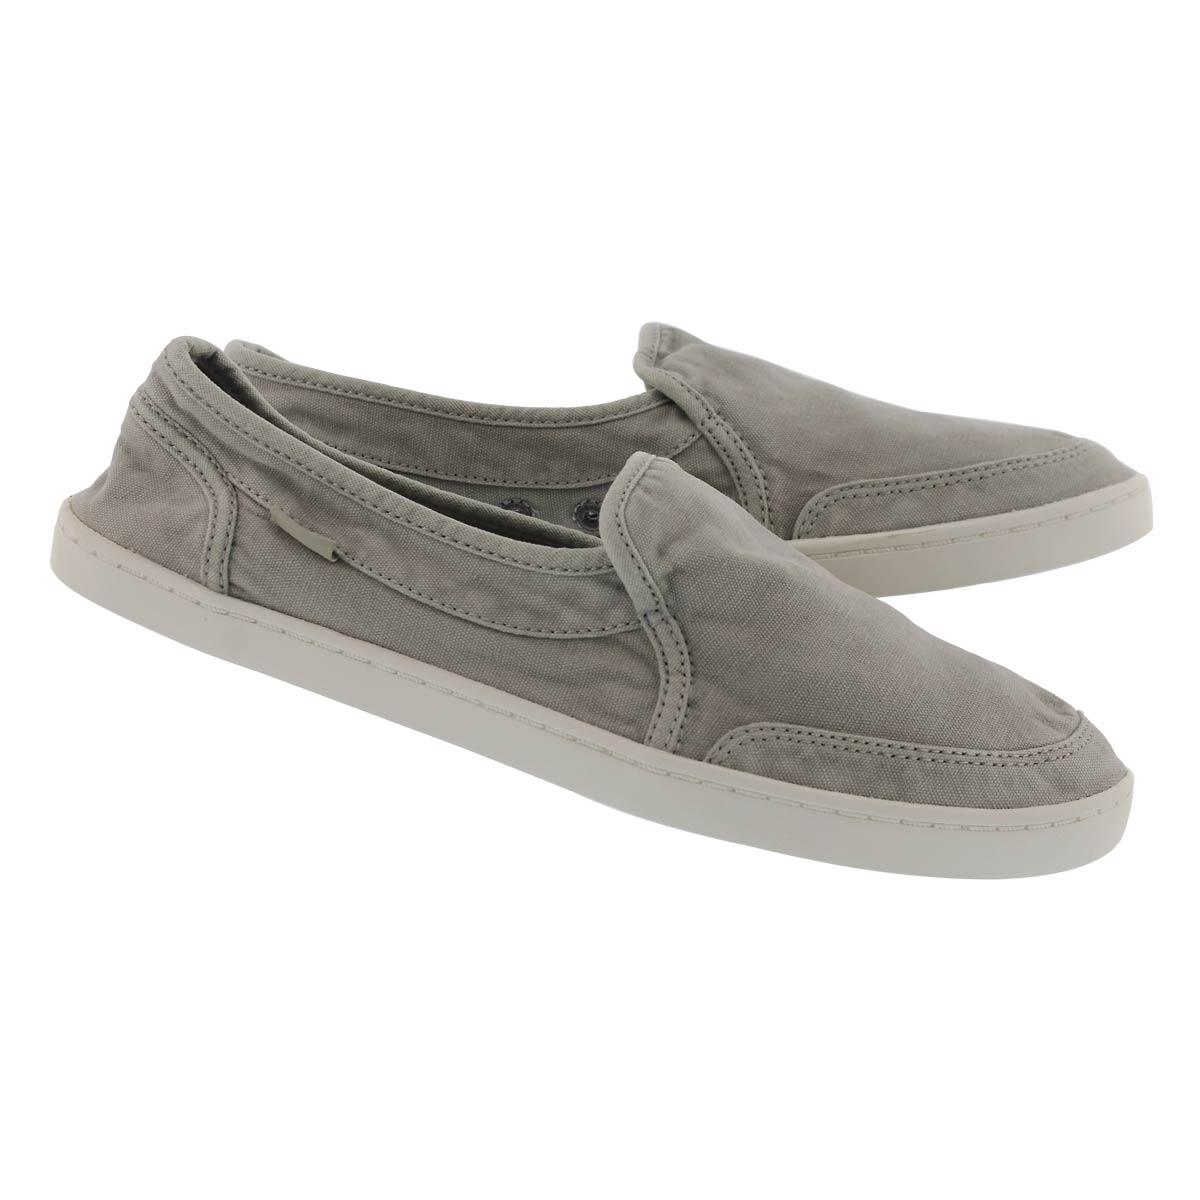 Lds Pair O Dice harbor mist slip on shoe